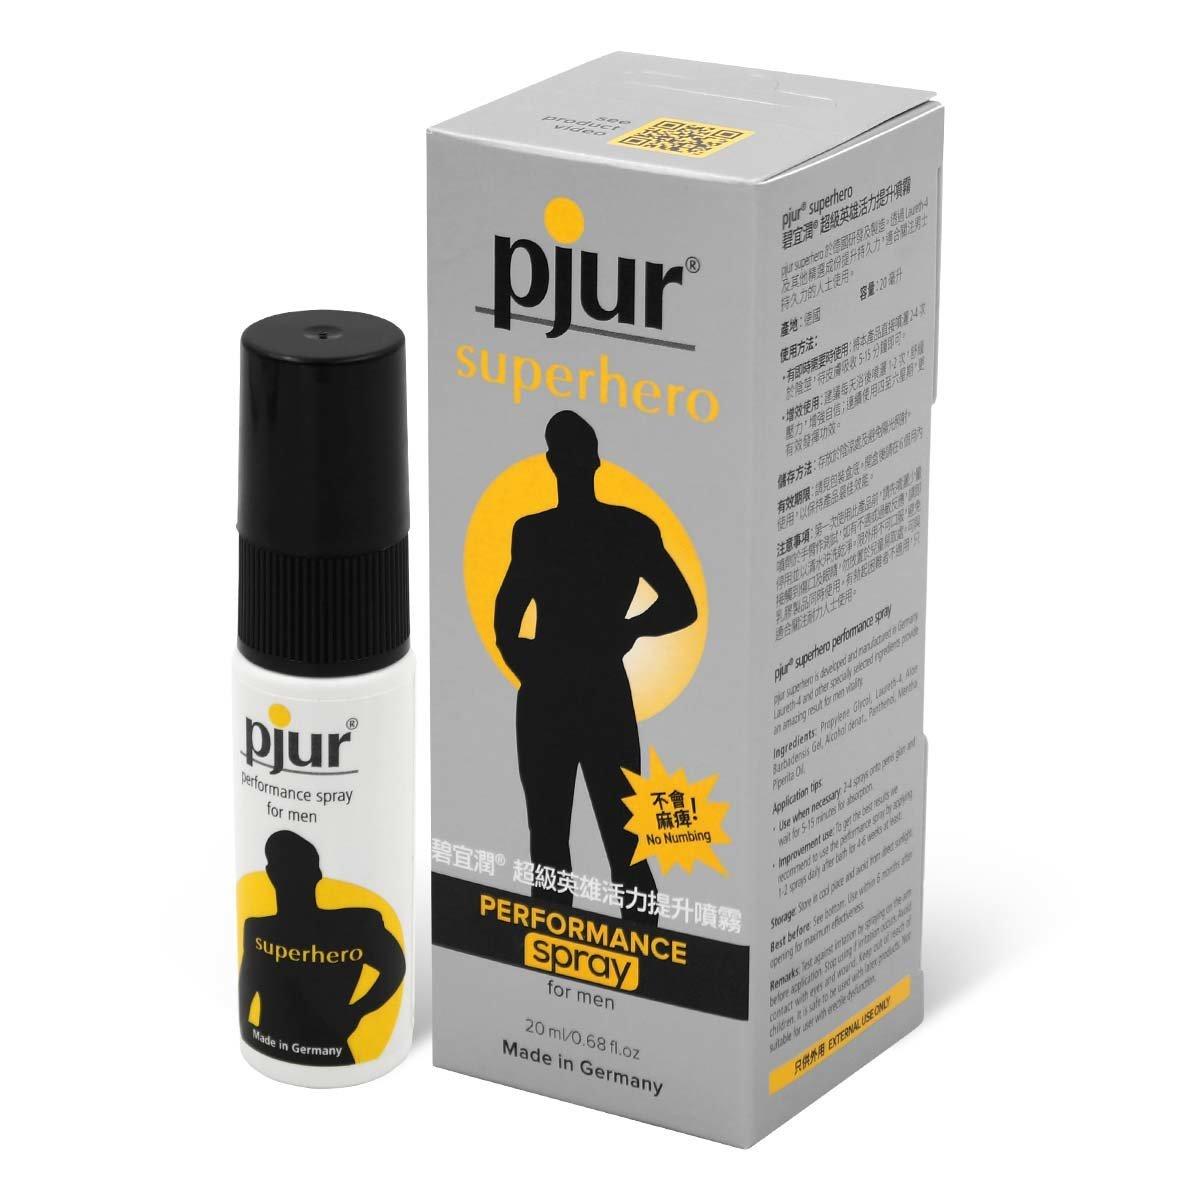 能力增強噴霧 Superhero Performance Spray for Men - 20ml